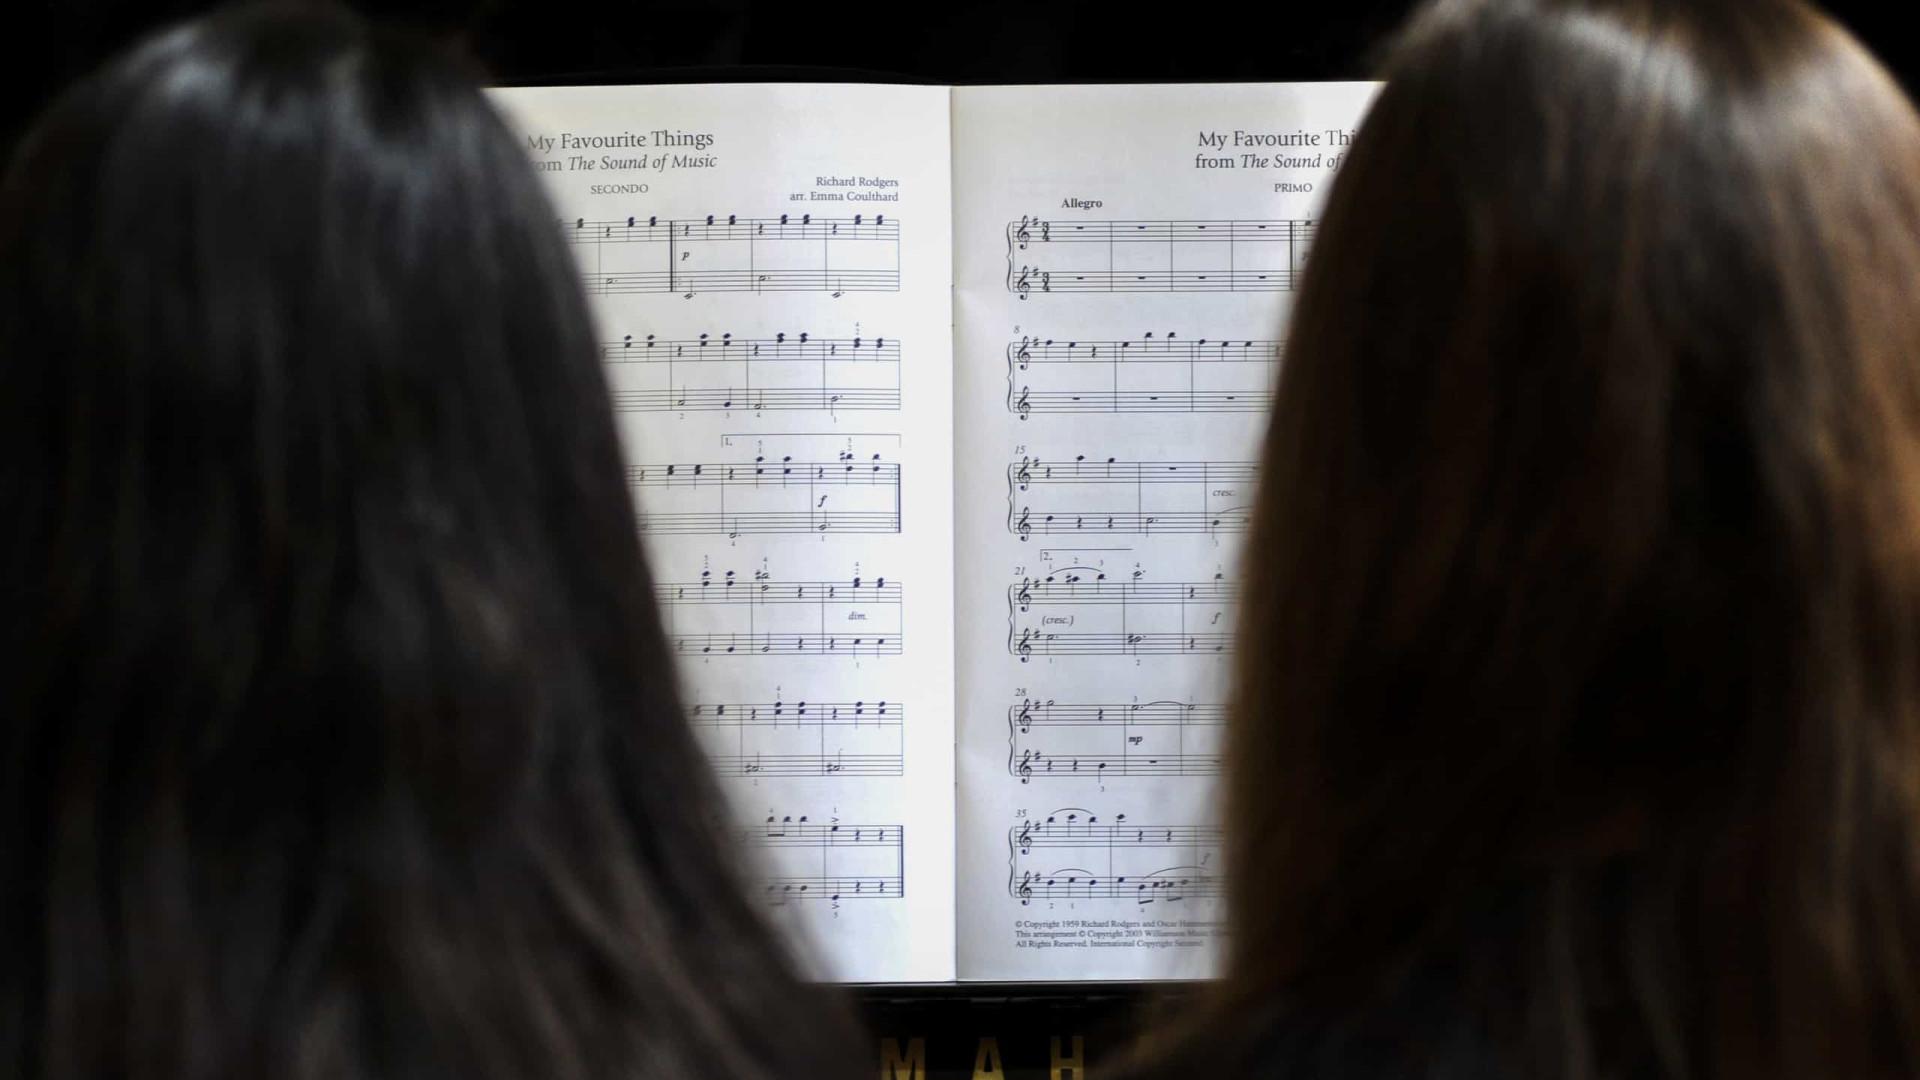 Pianista Joana Gama toca hoje obra de Erik Satie, durante 14 horas